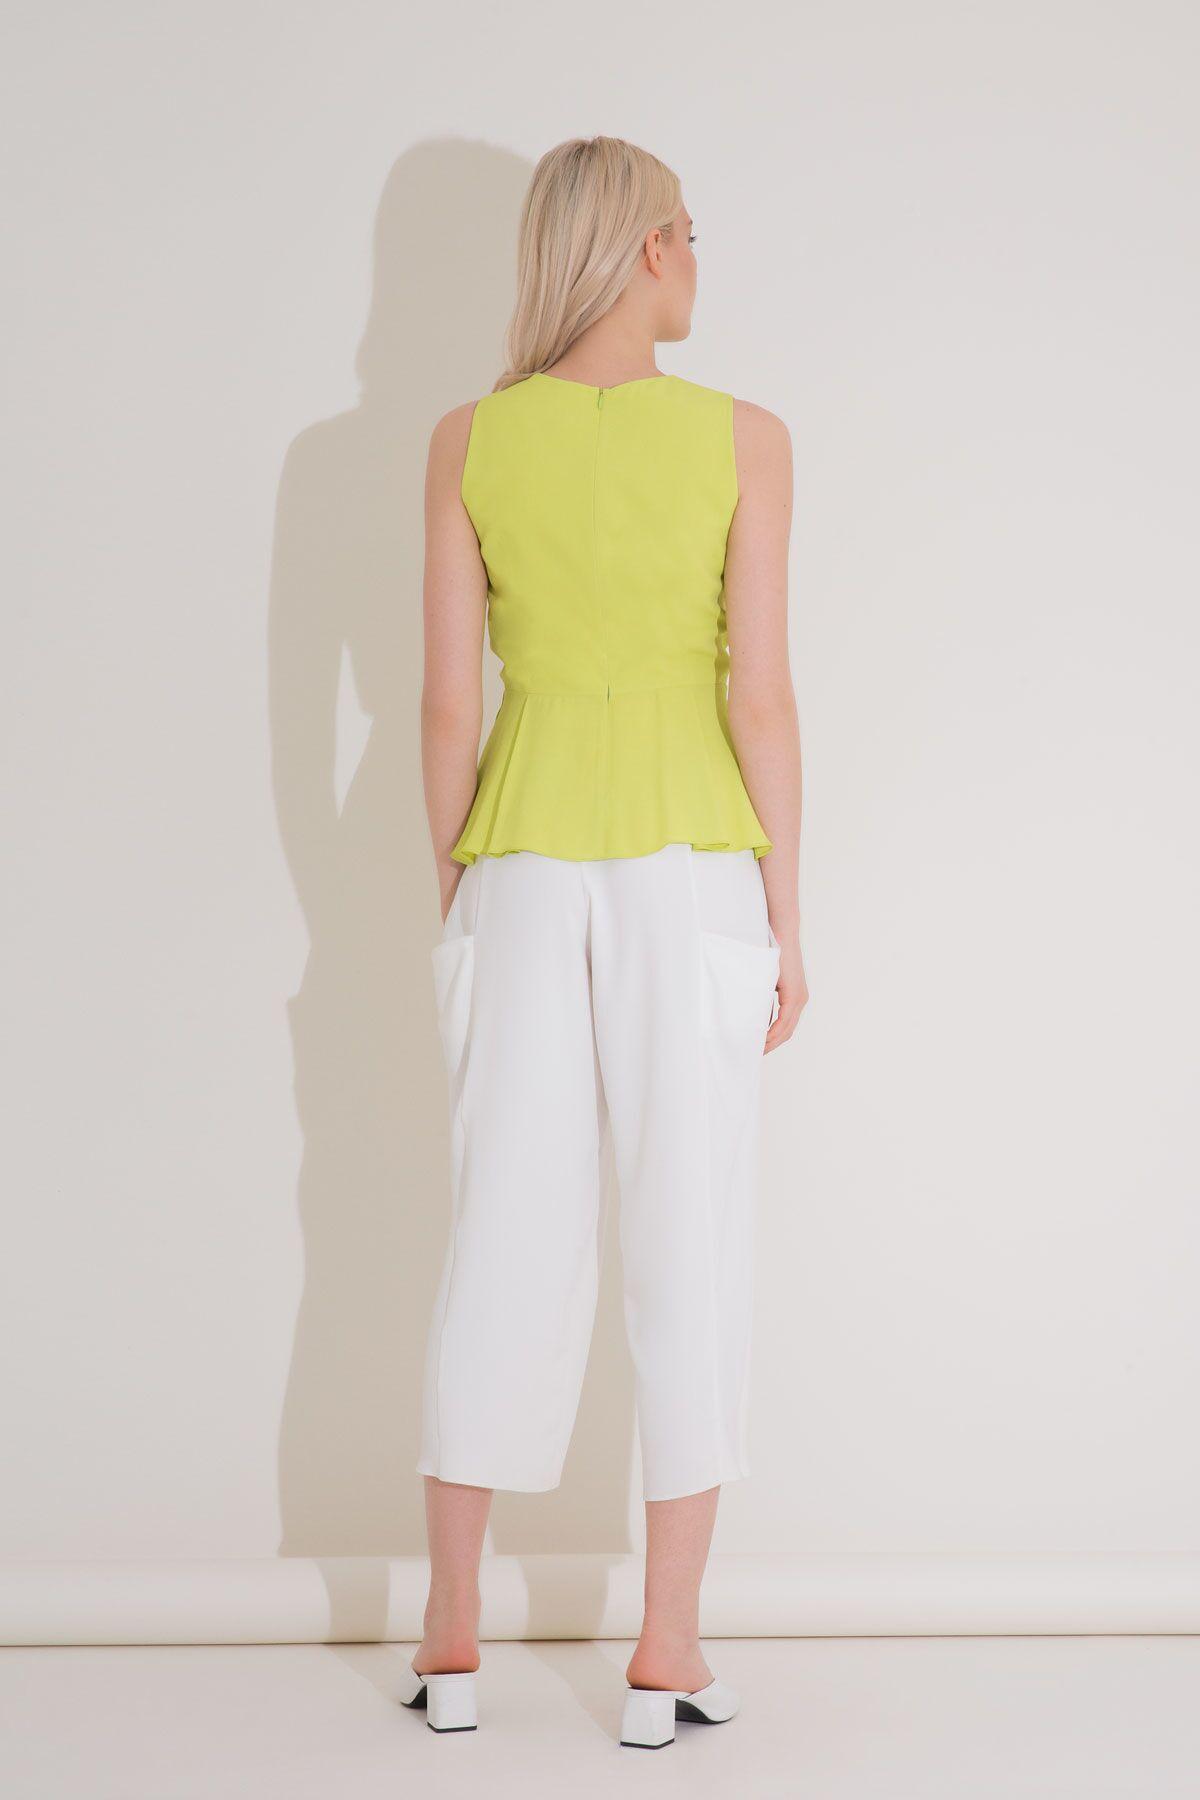 V Yaka Pili Detaylı Yeşil Viskon Bluz